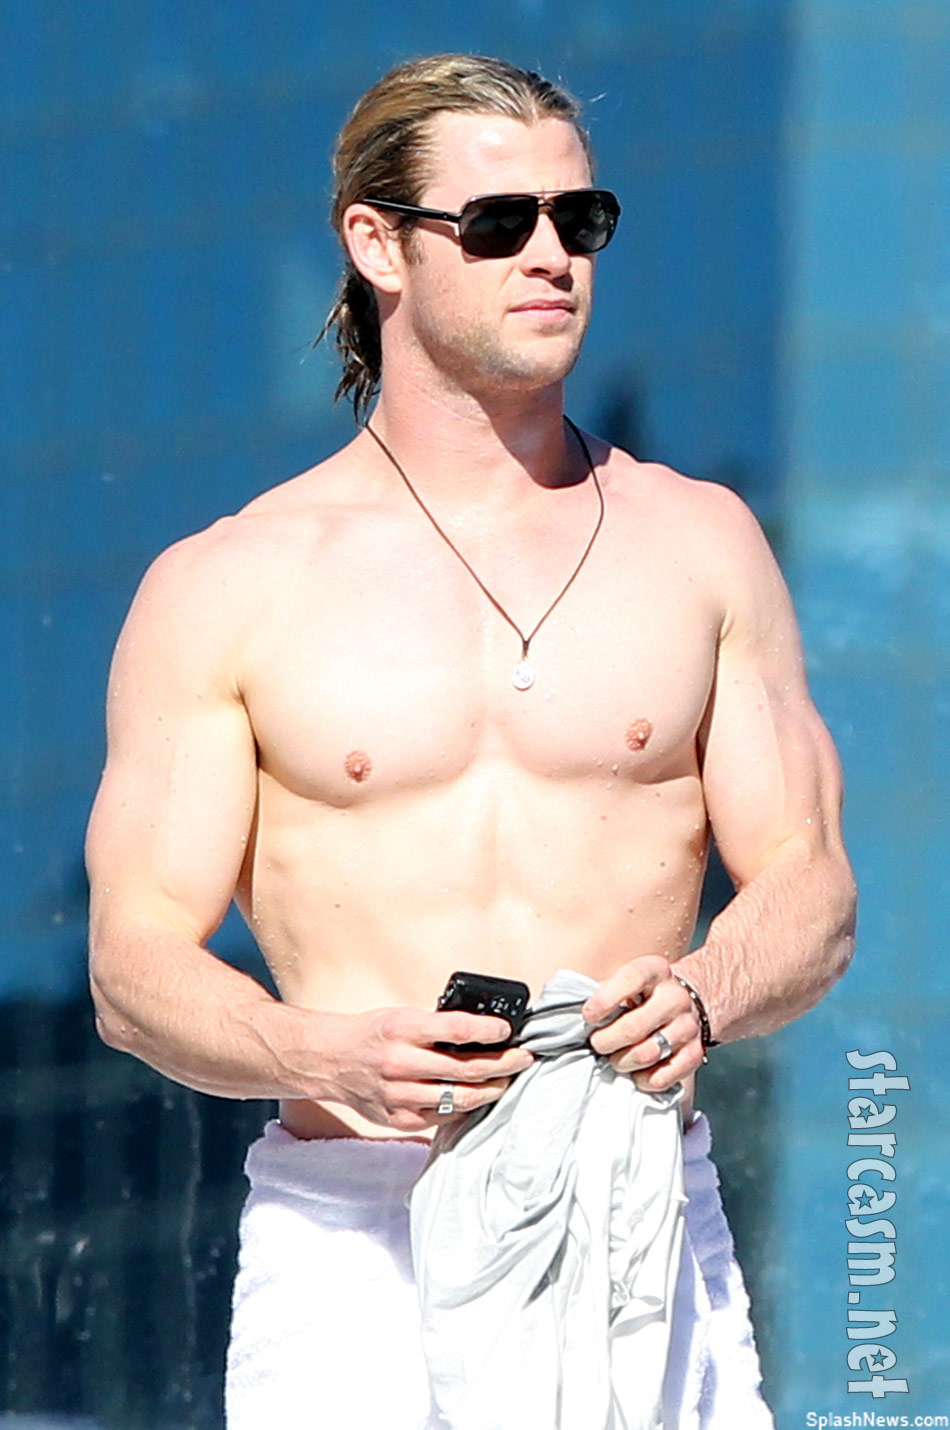 PHOTOS Chris Hemsworth displays Thor-like physique down